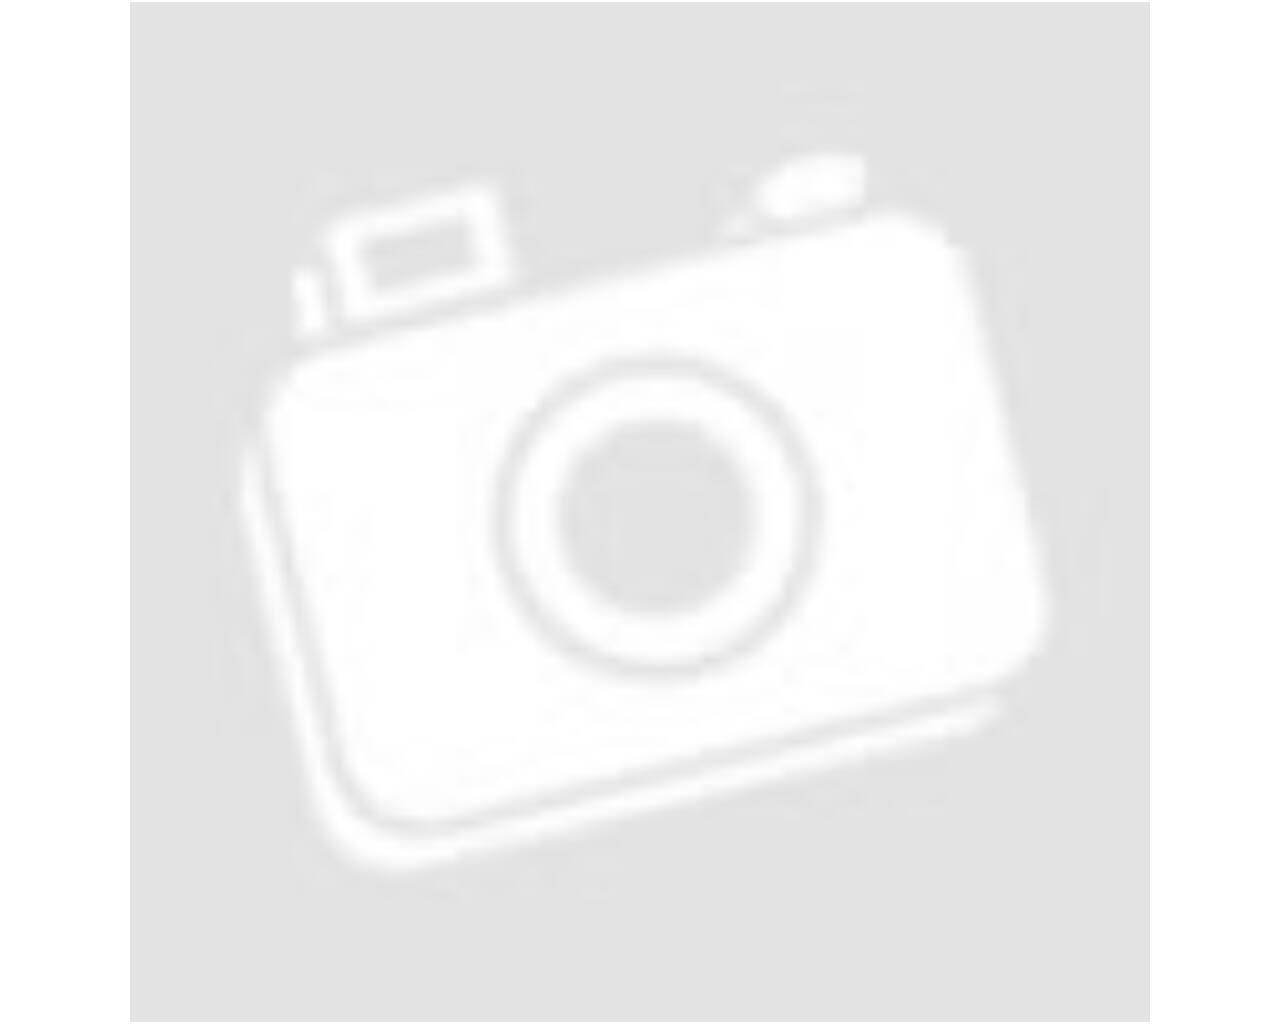 Zass ventilátor, 45 W, 3 sebesség, 40,6 cm, fehér